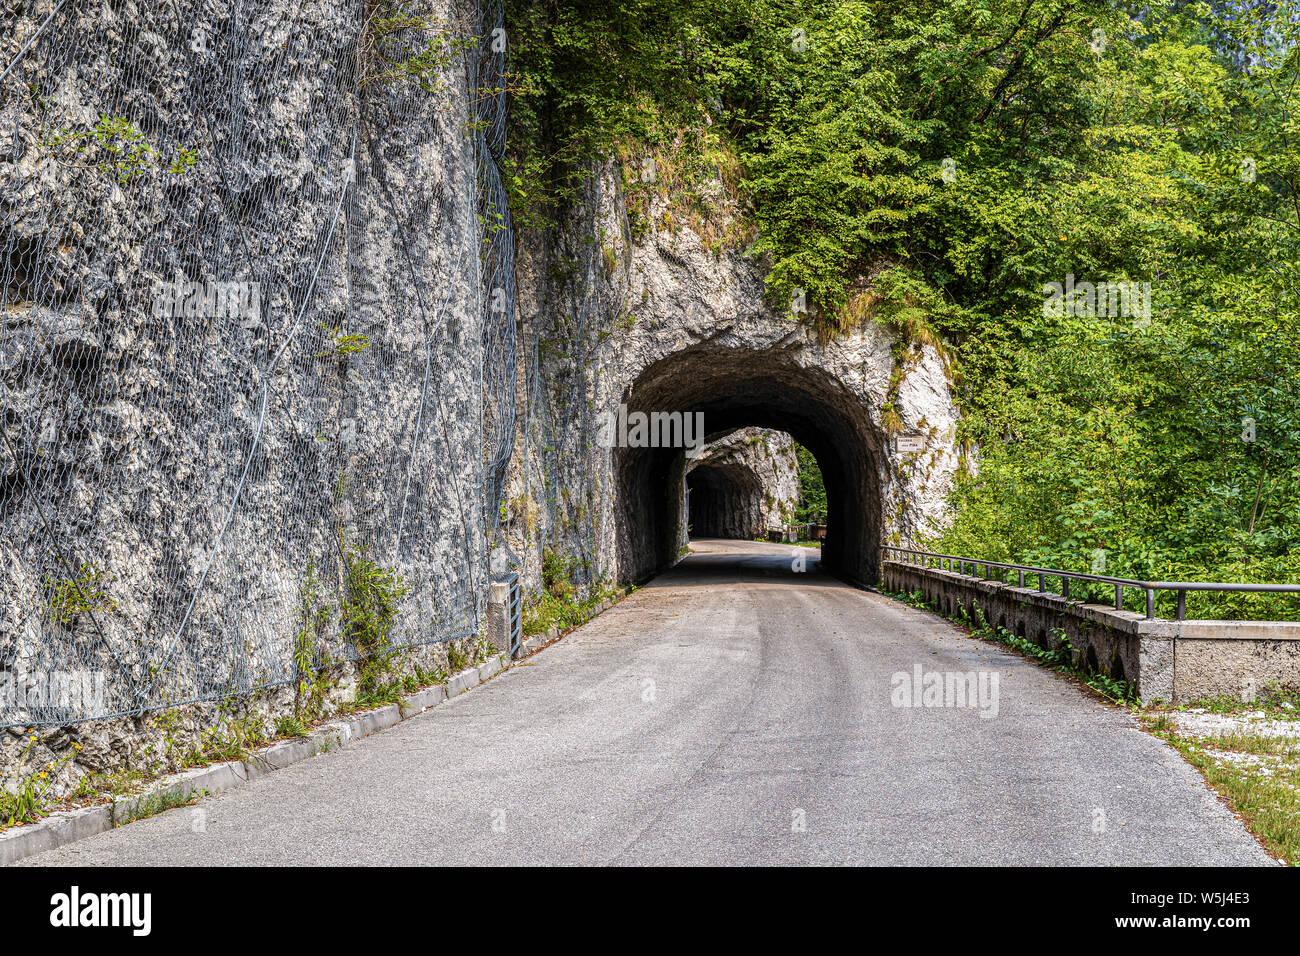 Italy Friuli Val Cellina Barcis - old road of the Valcellina - Natural park of Dolomiti Friulane Stock Photo